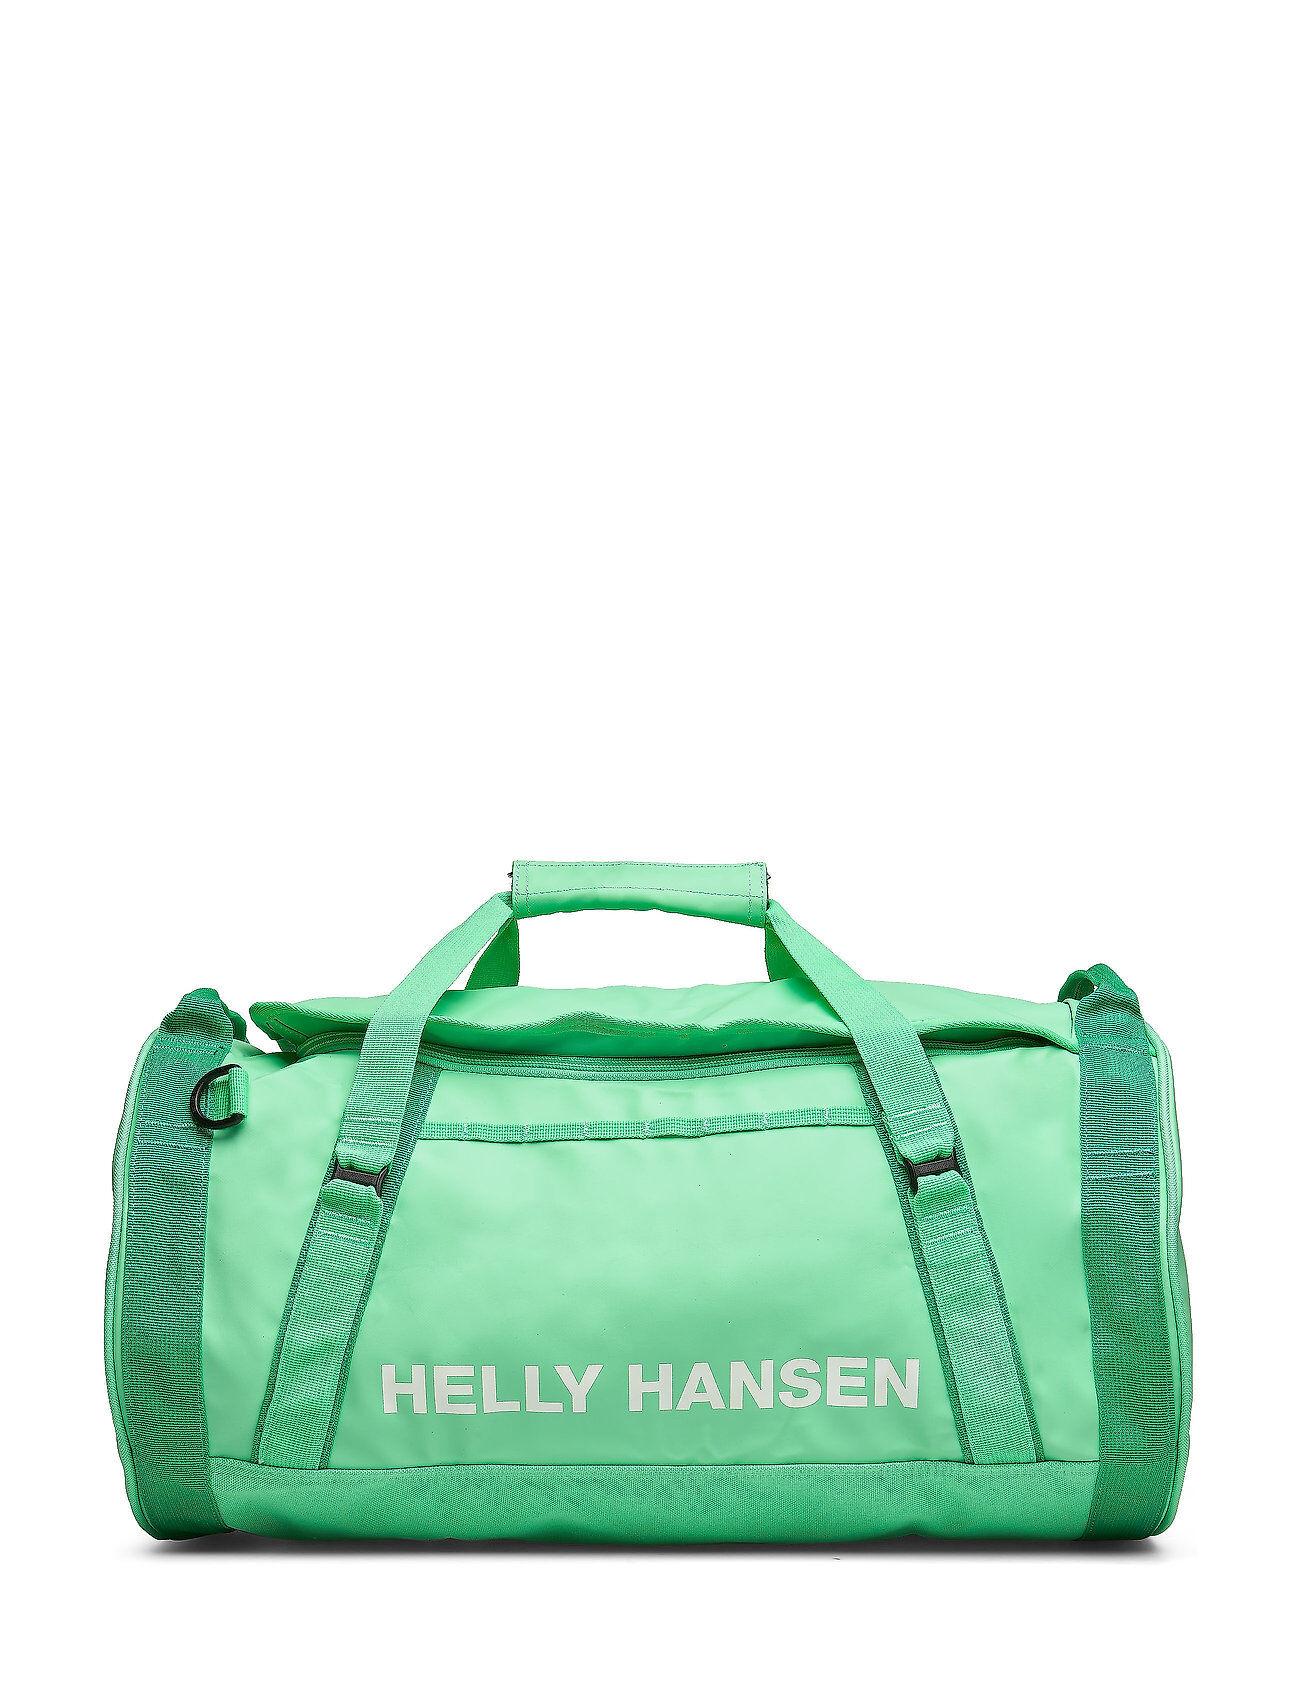 Image of Helly Hansen Hh Duffel Bag 2 30l Bags Weekend & Gym Bags Vihreä Helly Hansen